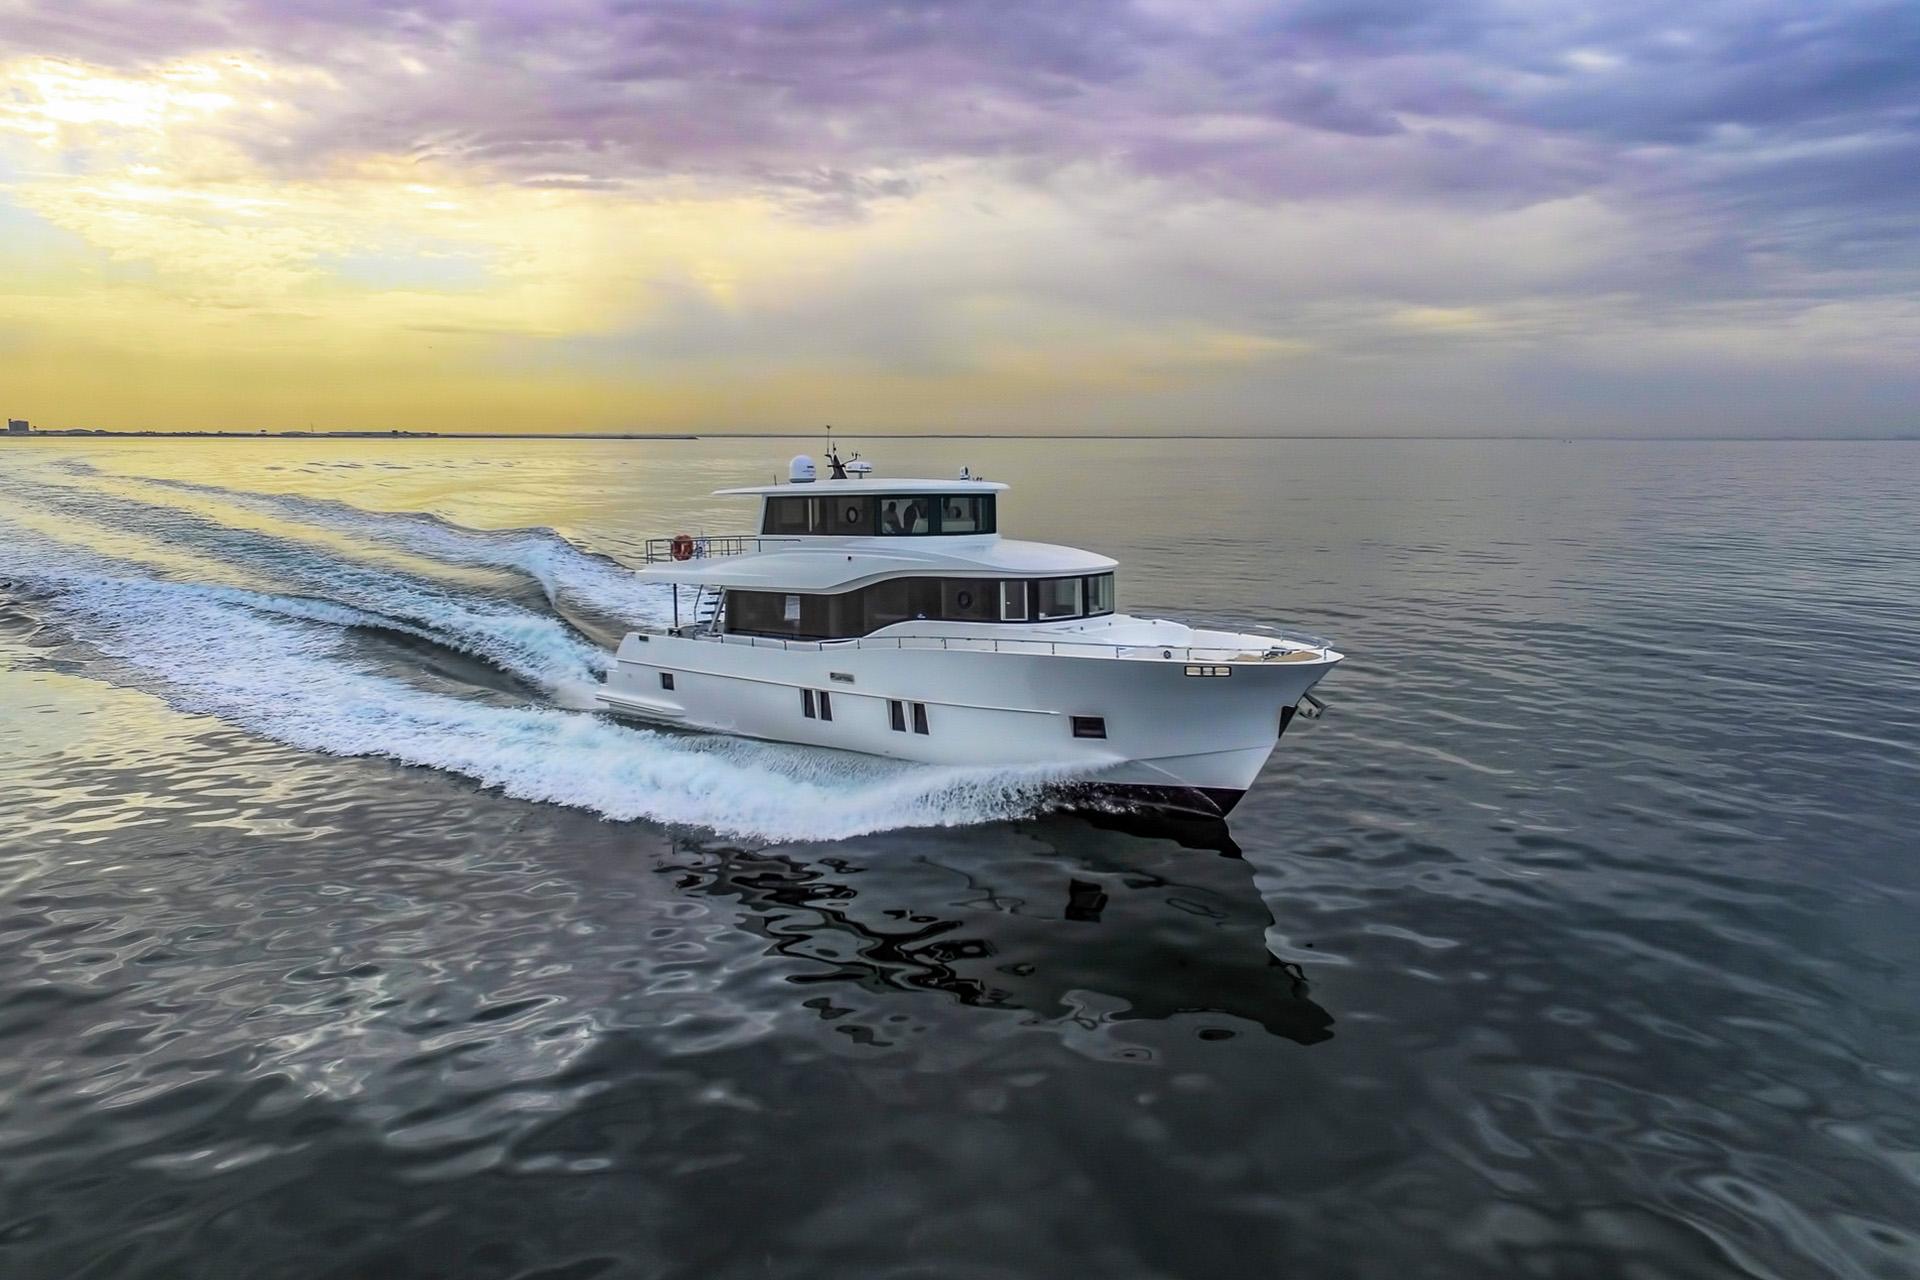 Nomad 65 SUV - Nomad Yachts by - Drettmann Yachts